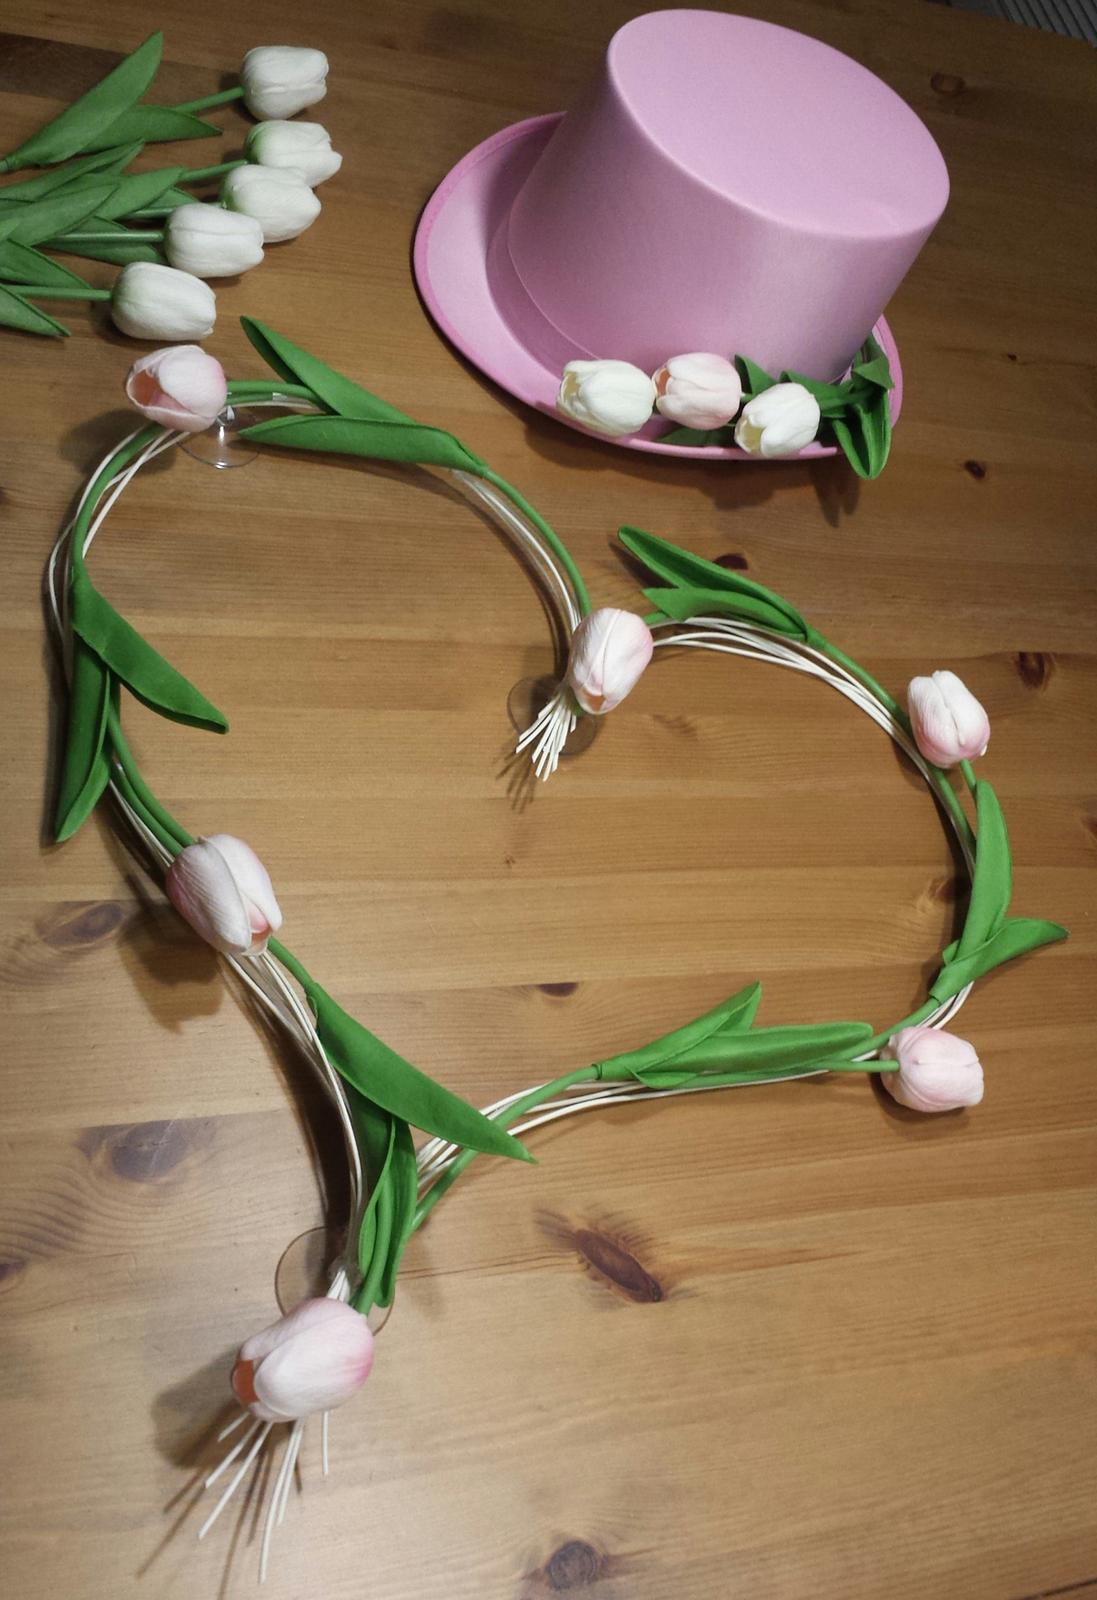 Pedigove srdce na kapotu tulipany - Obrázek č. 1